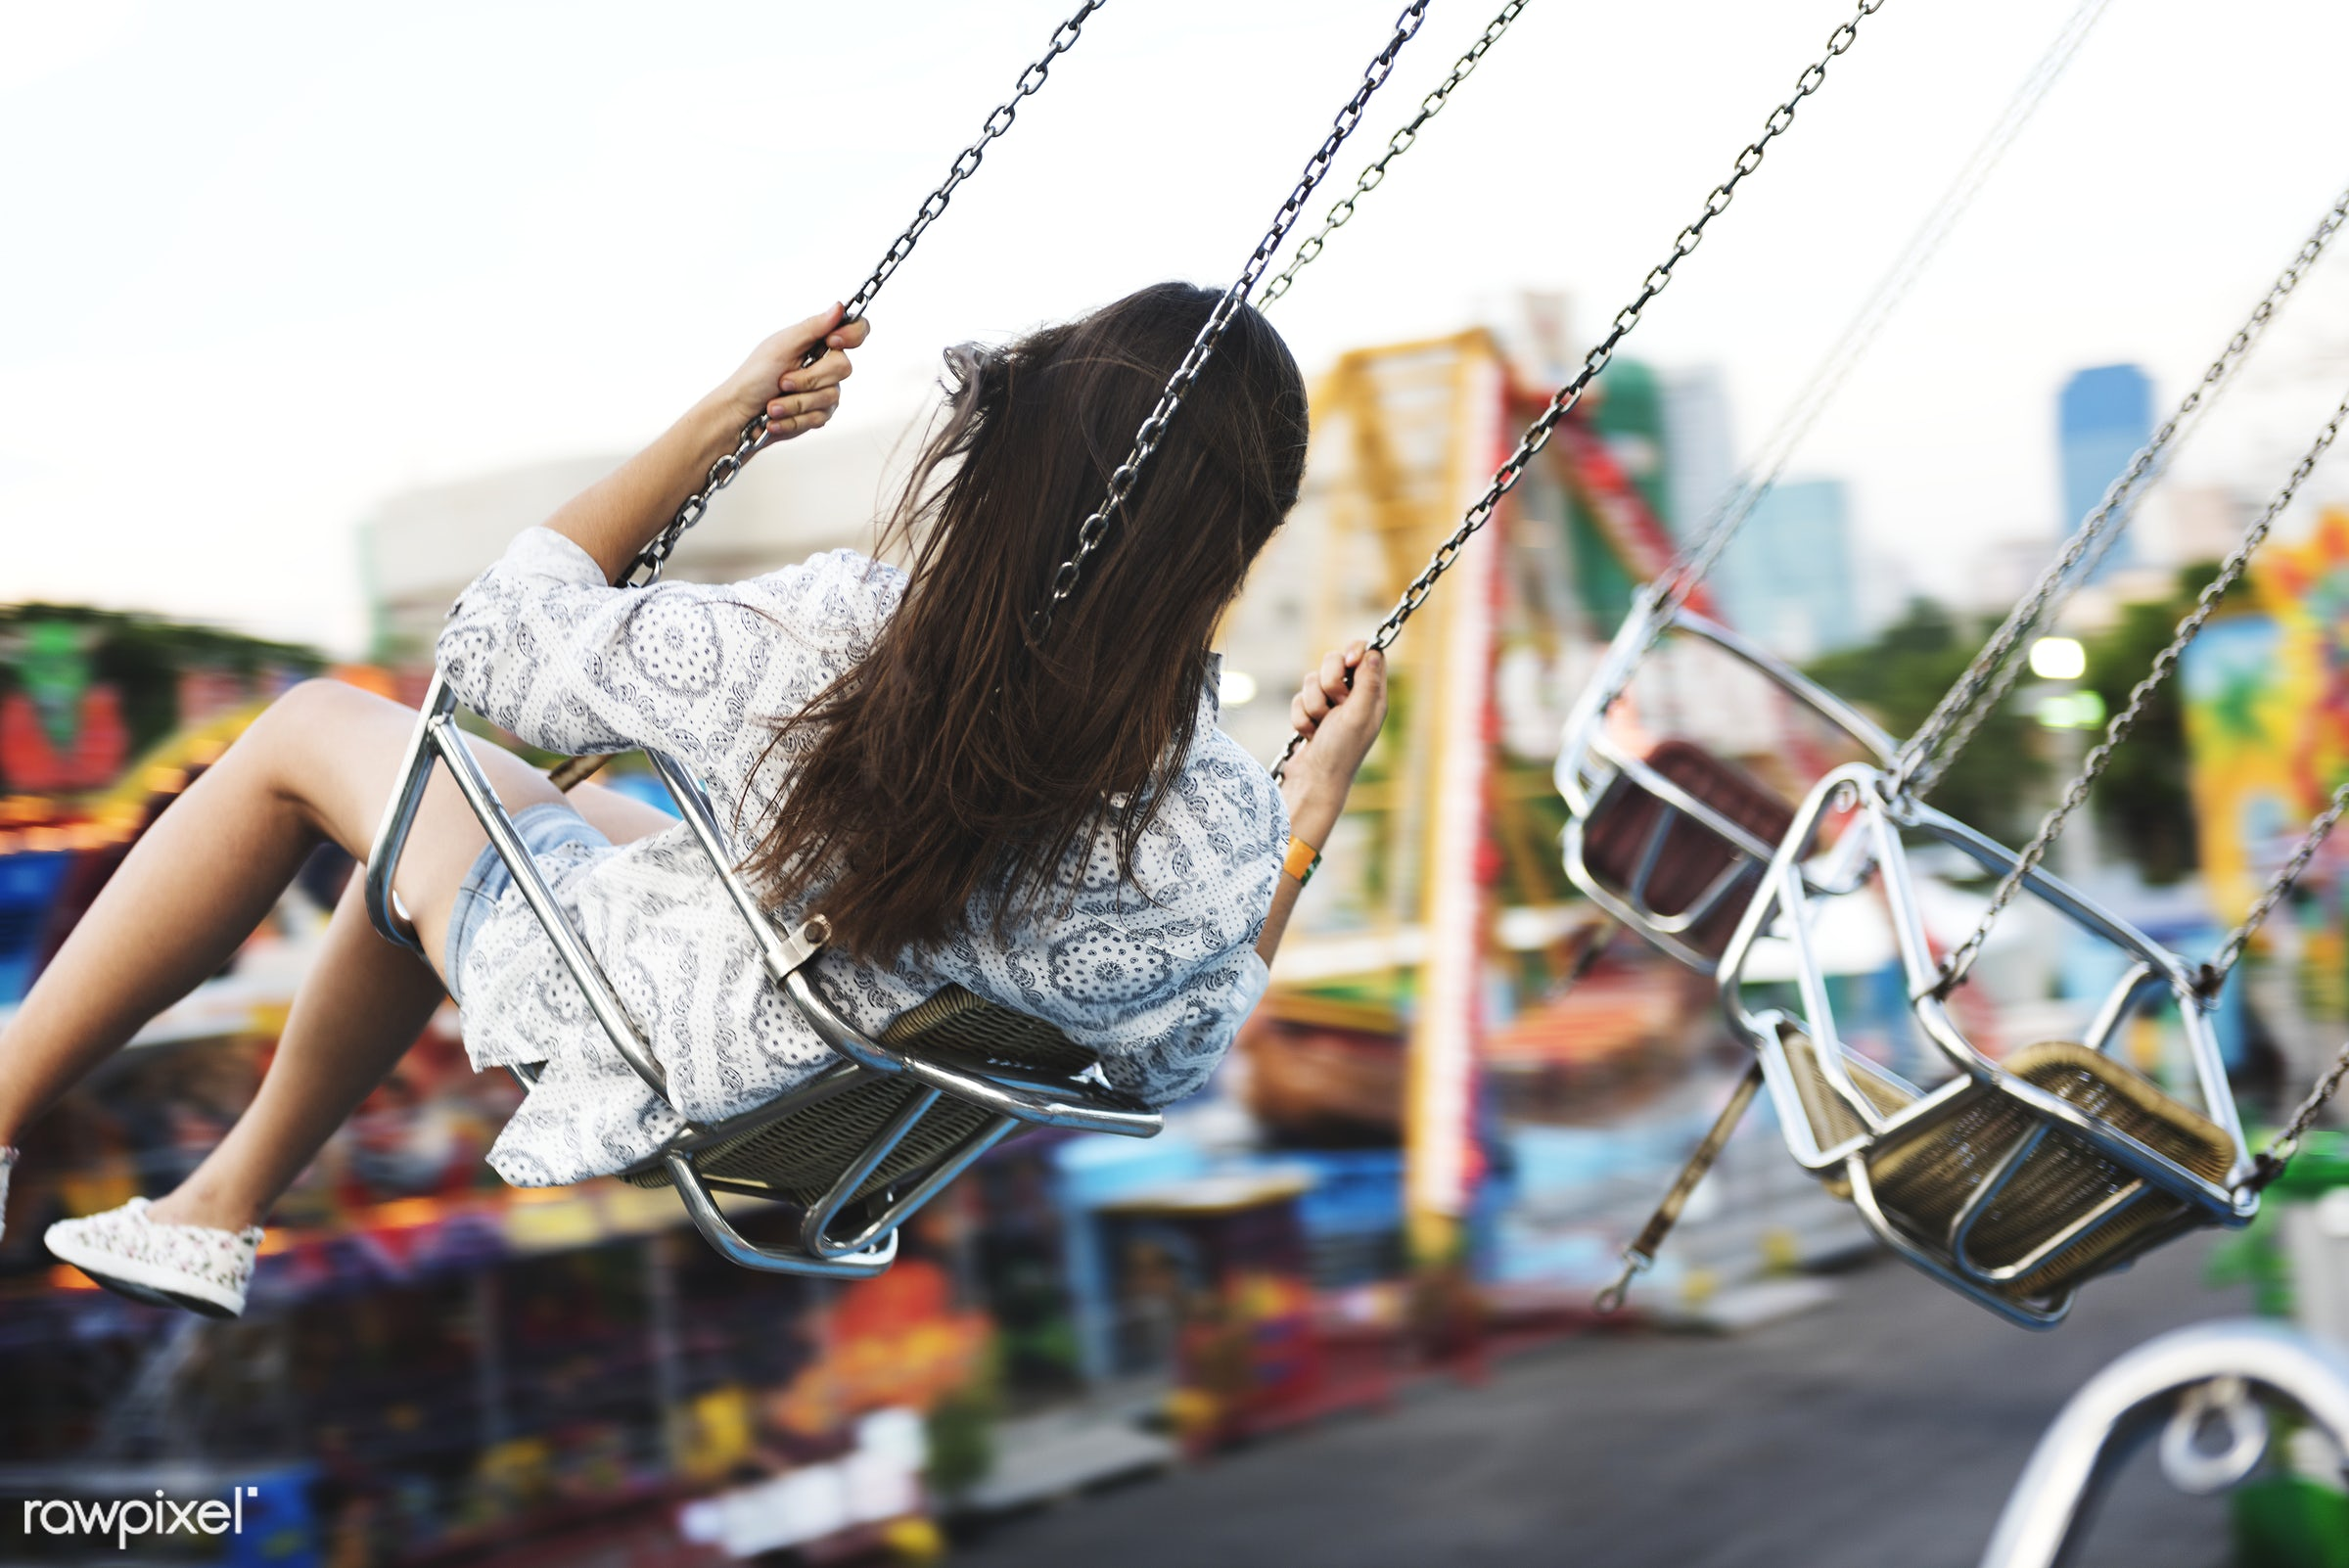 amusement park, enjoyment, expression, feeling, friends, friendship, fun, fun park, group, happiness, man, people, riding,...